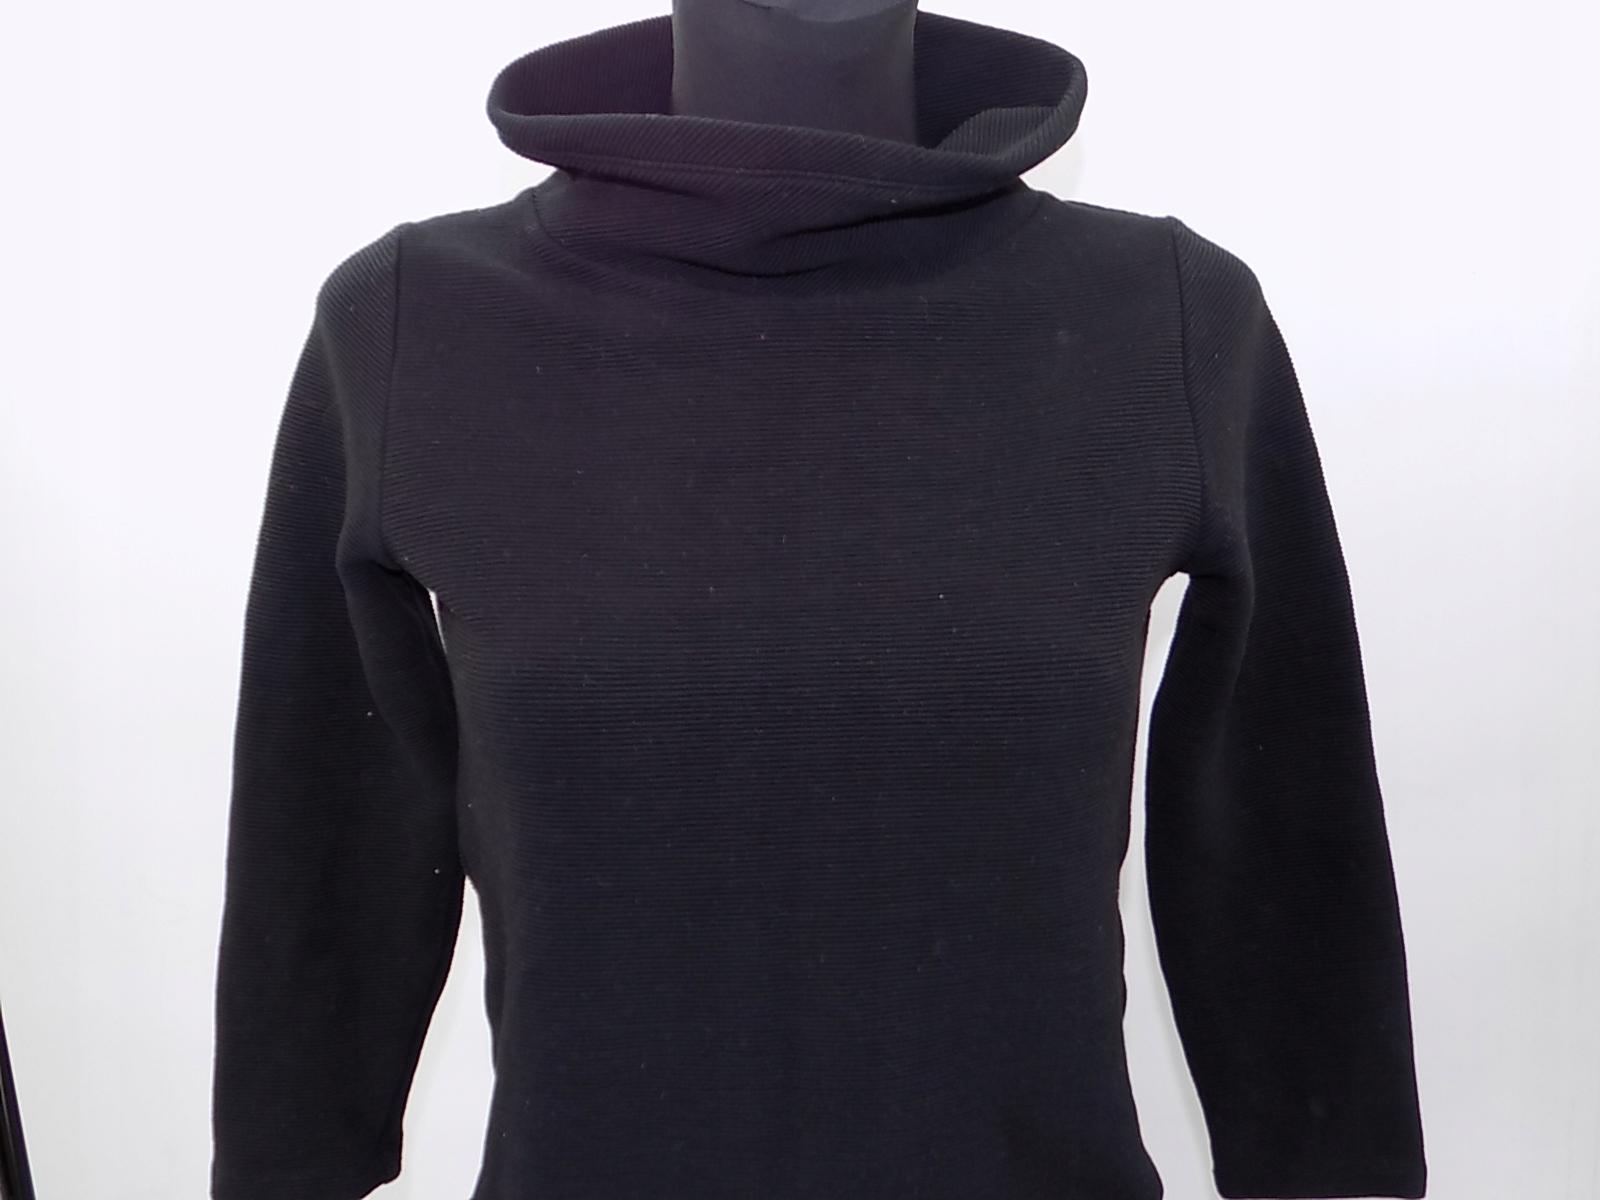 687a8371b Hobbs London sweter damski XS golf rękaw 3/4 7743162988 - Allegro.pl